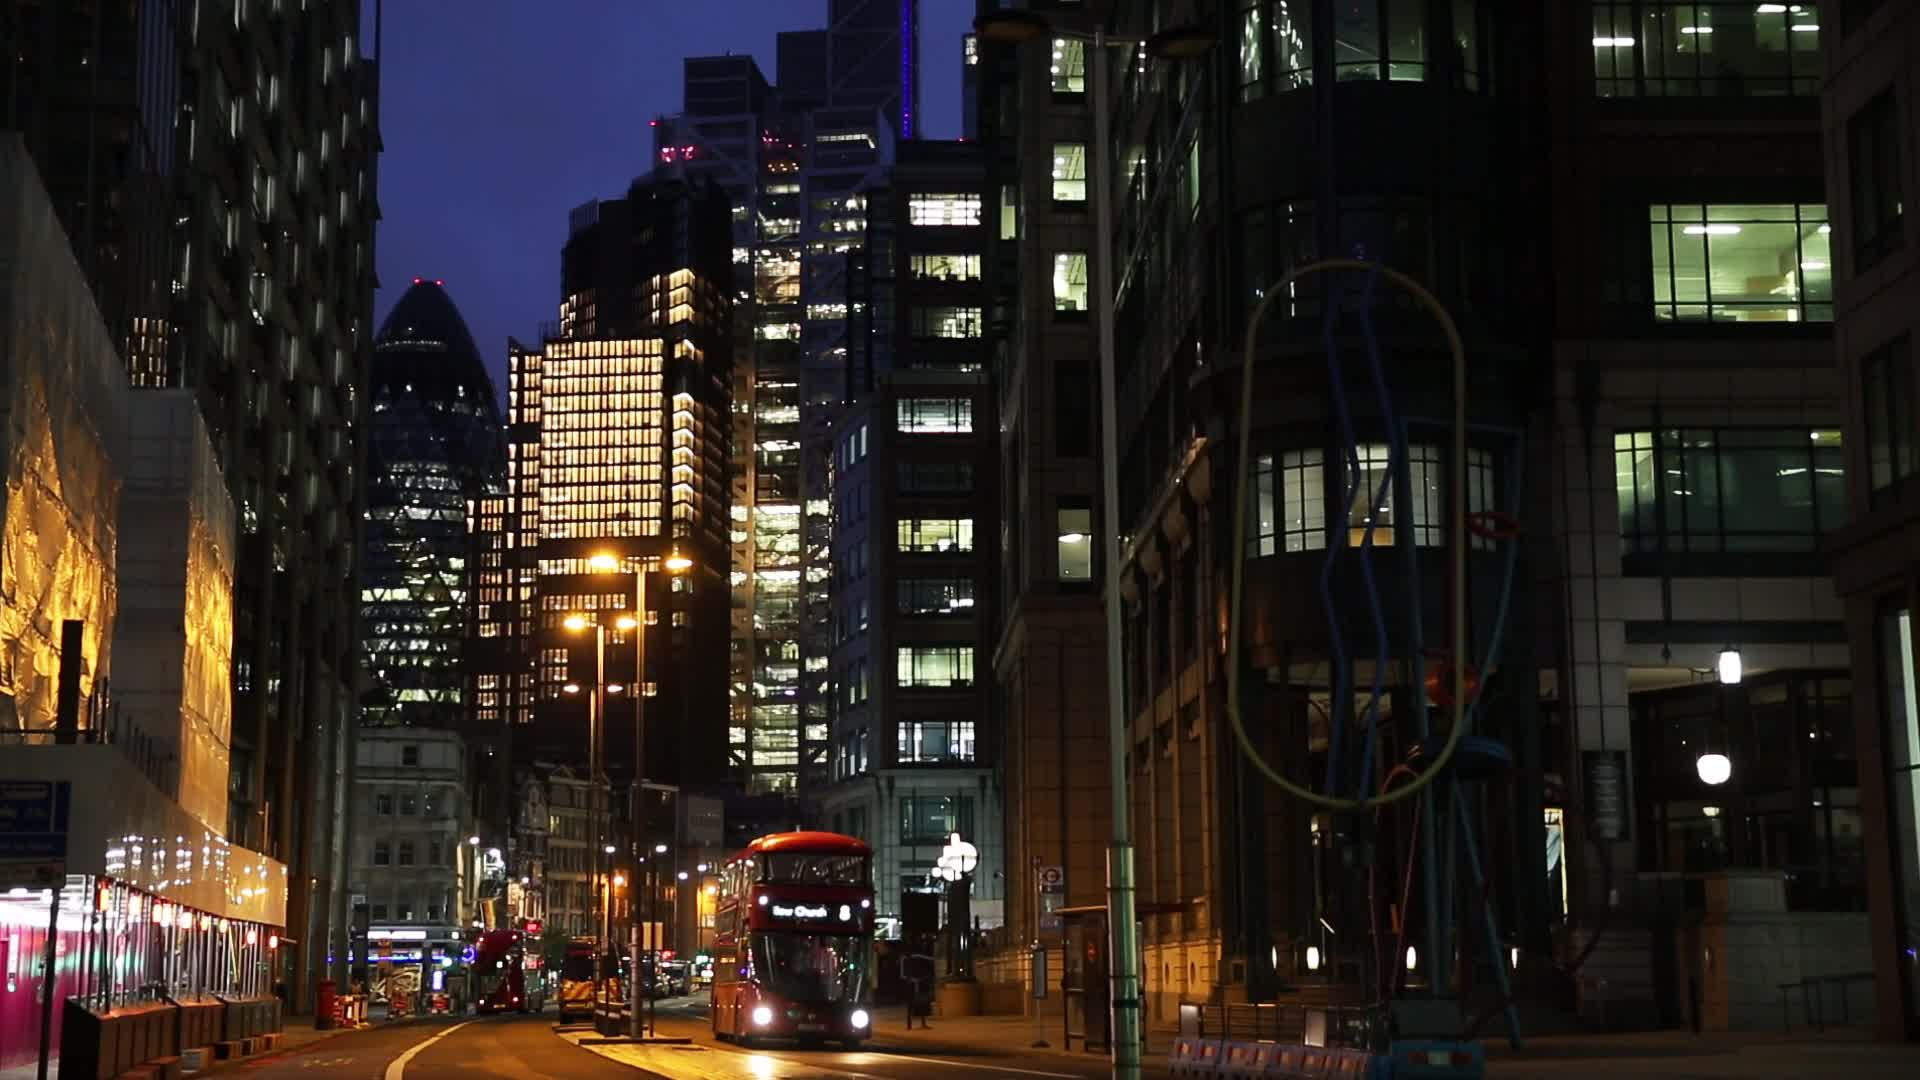 Third lockdown in London